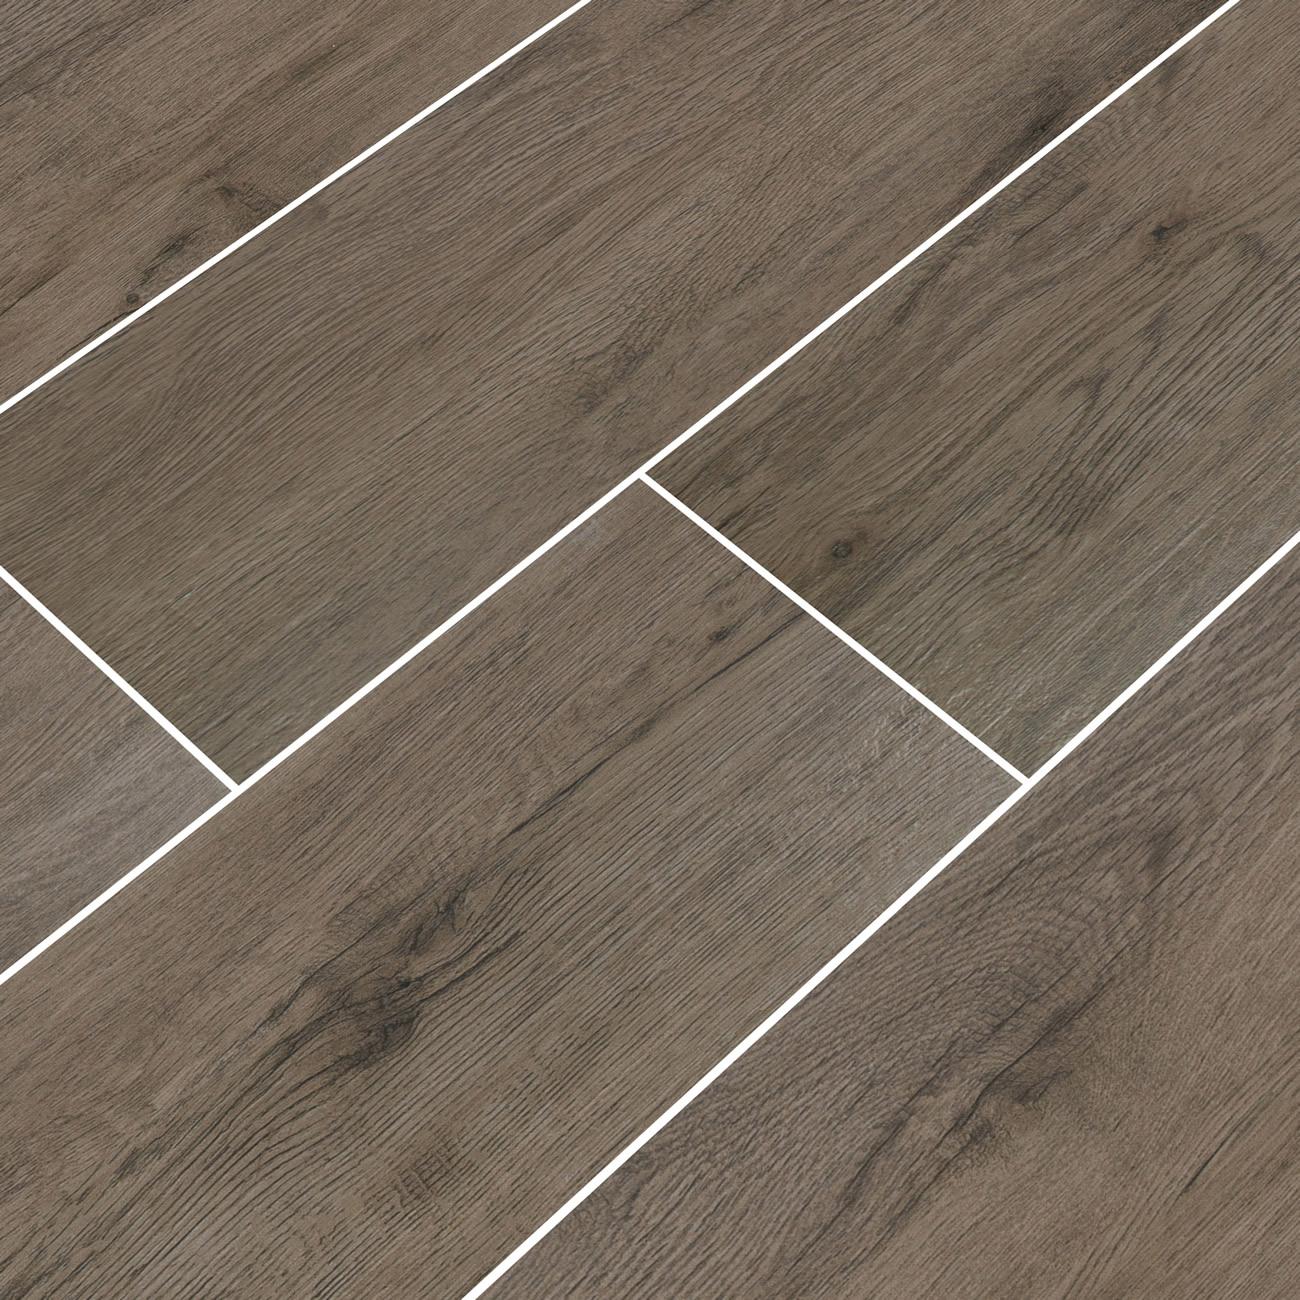 Home Floor Wall Tile Ceramic Celeste Taupe 8x40